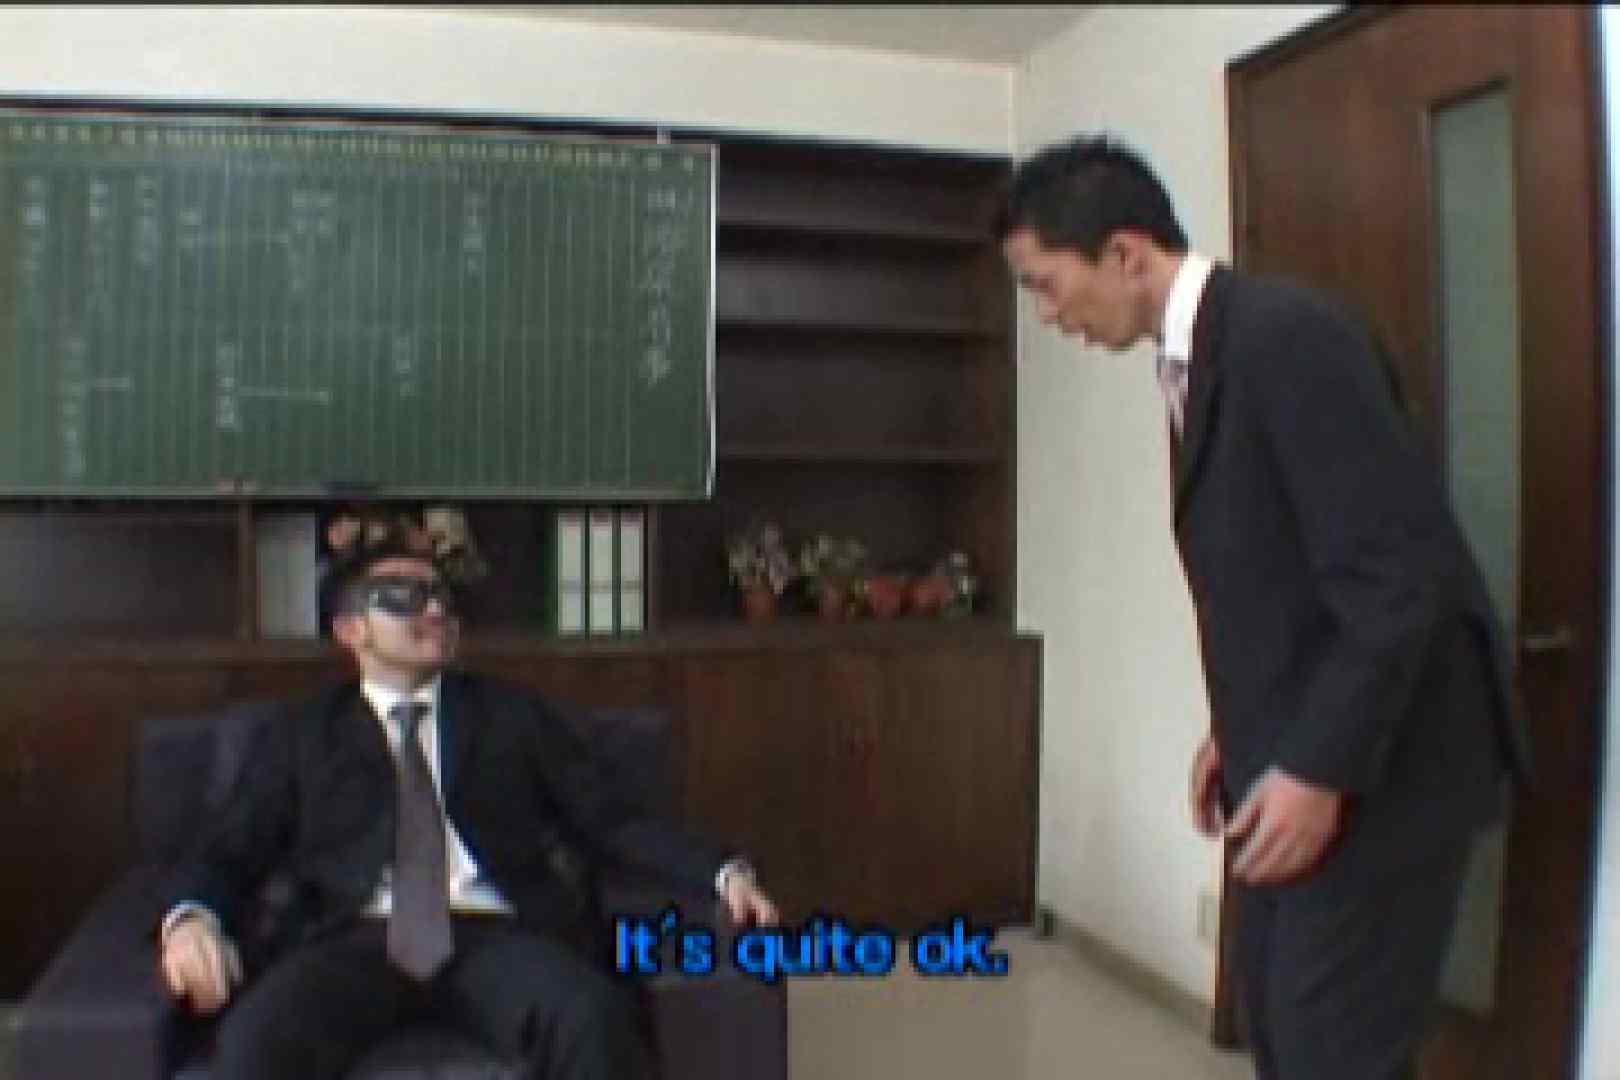 怒涛の集団攻撃!!vol.01 裸  77pic